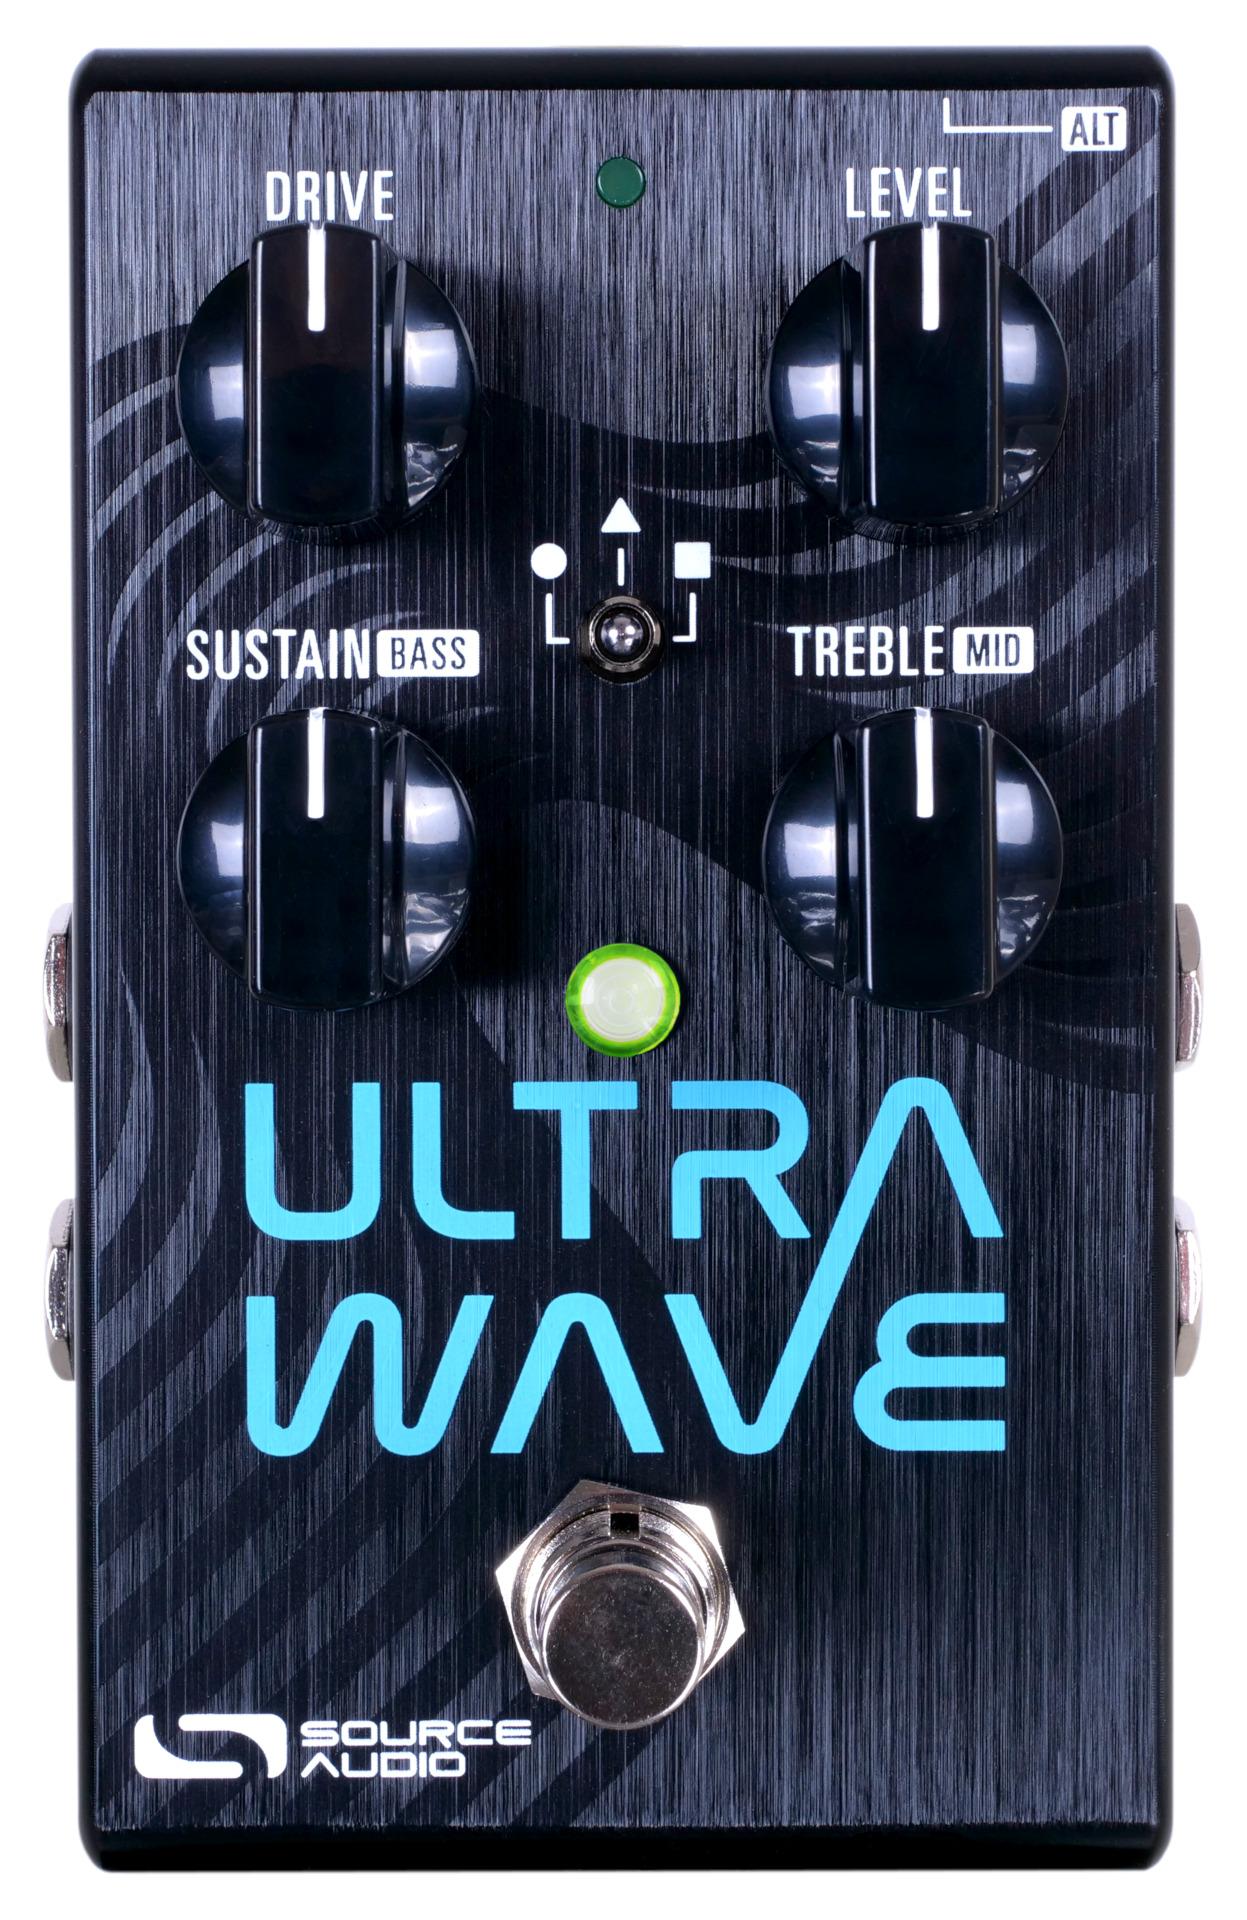 Source Audio SA 250 – One Series Ultrawave Multiband Processor